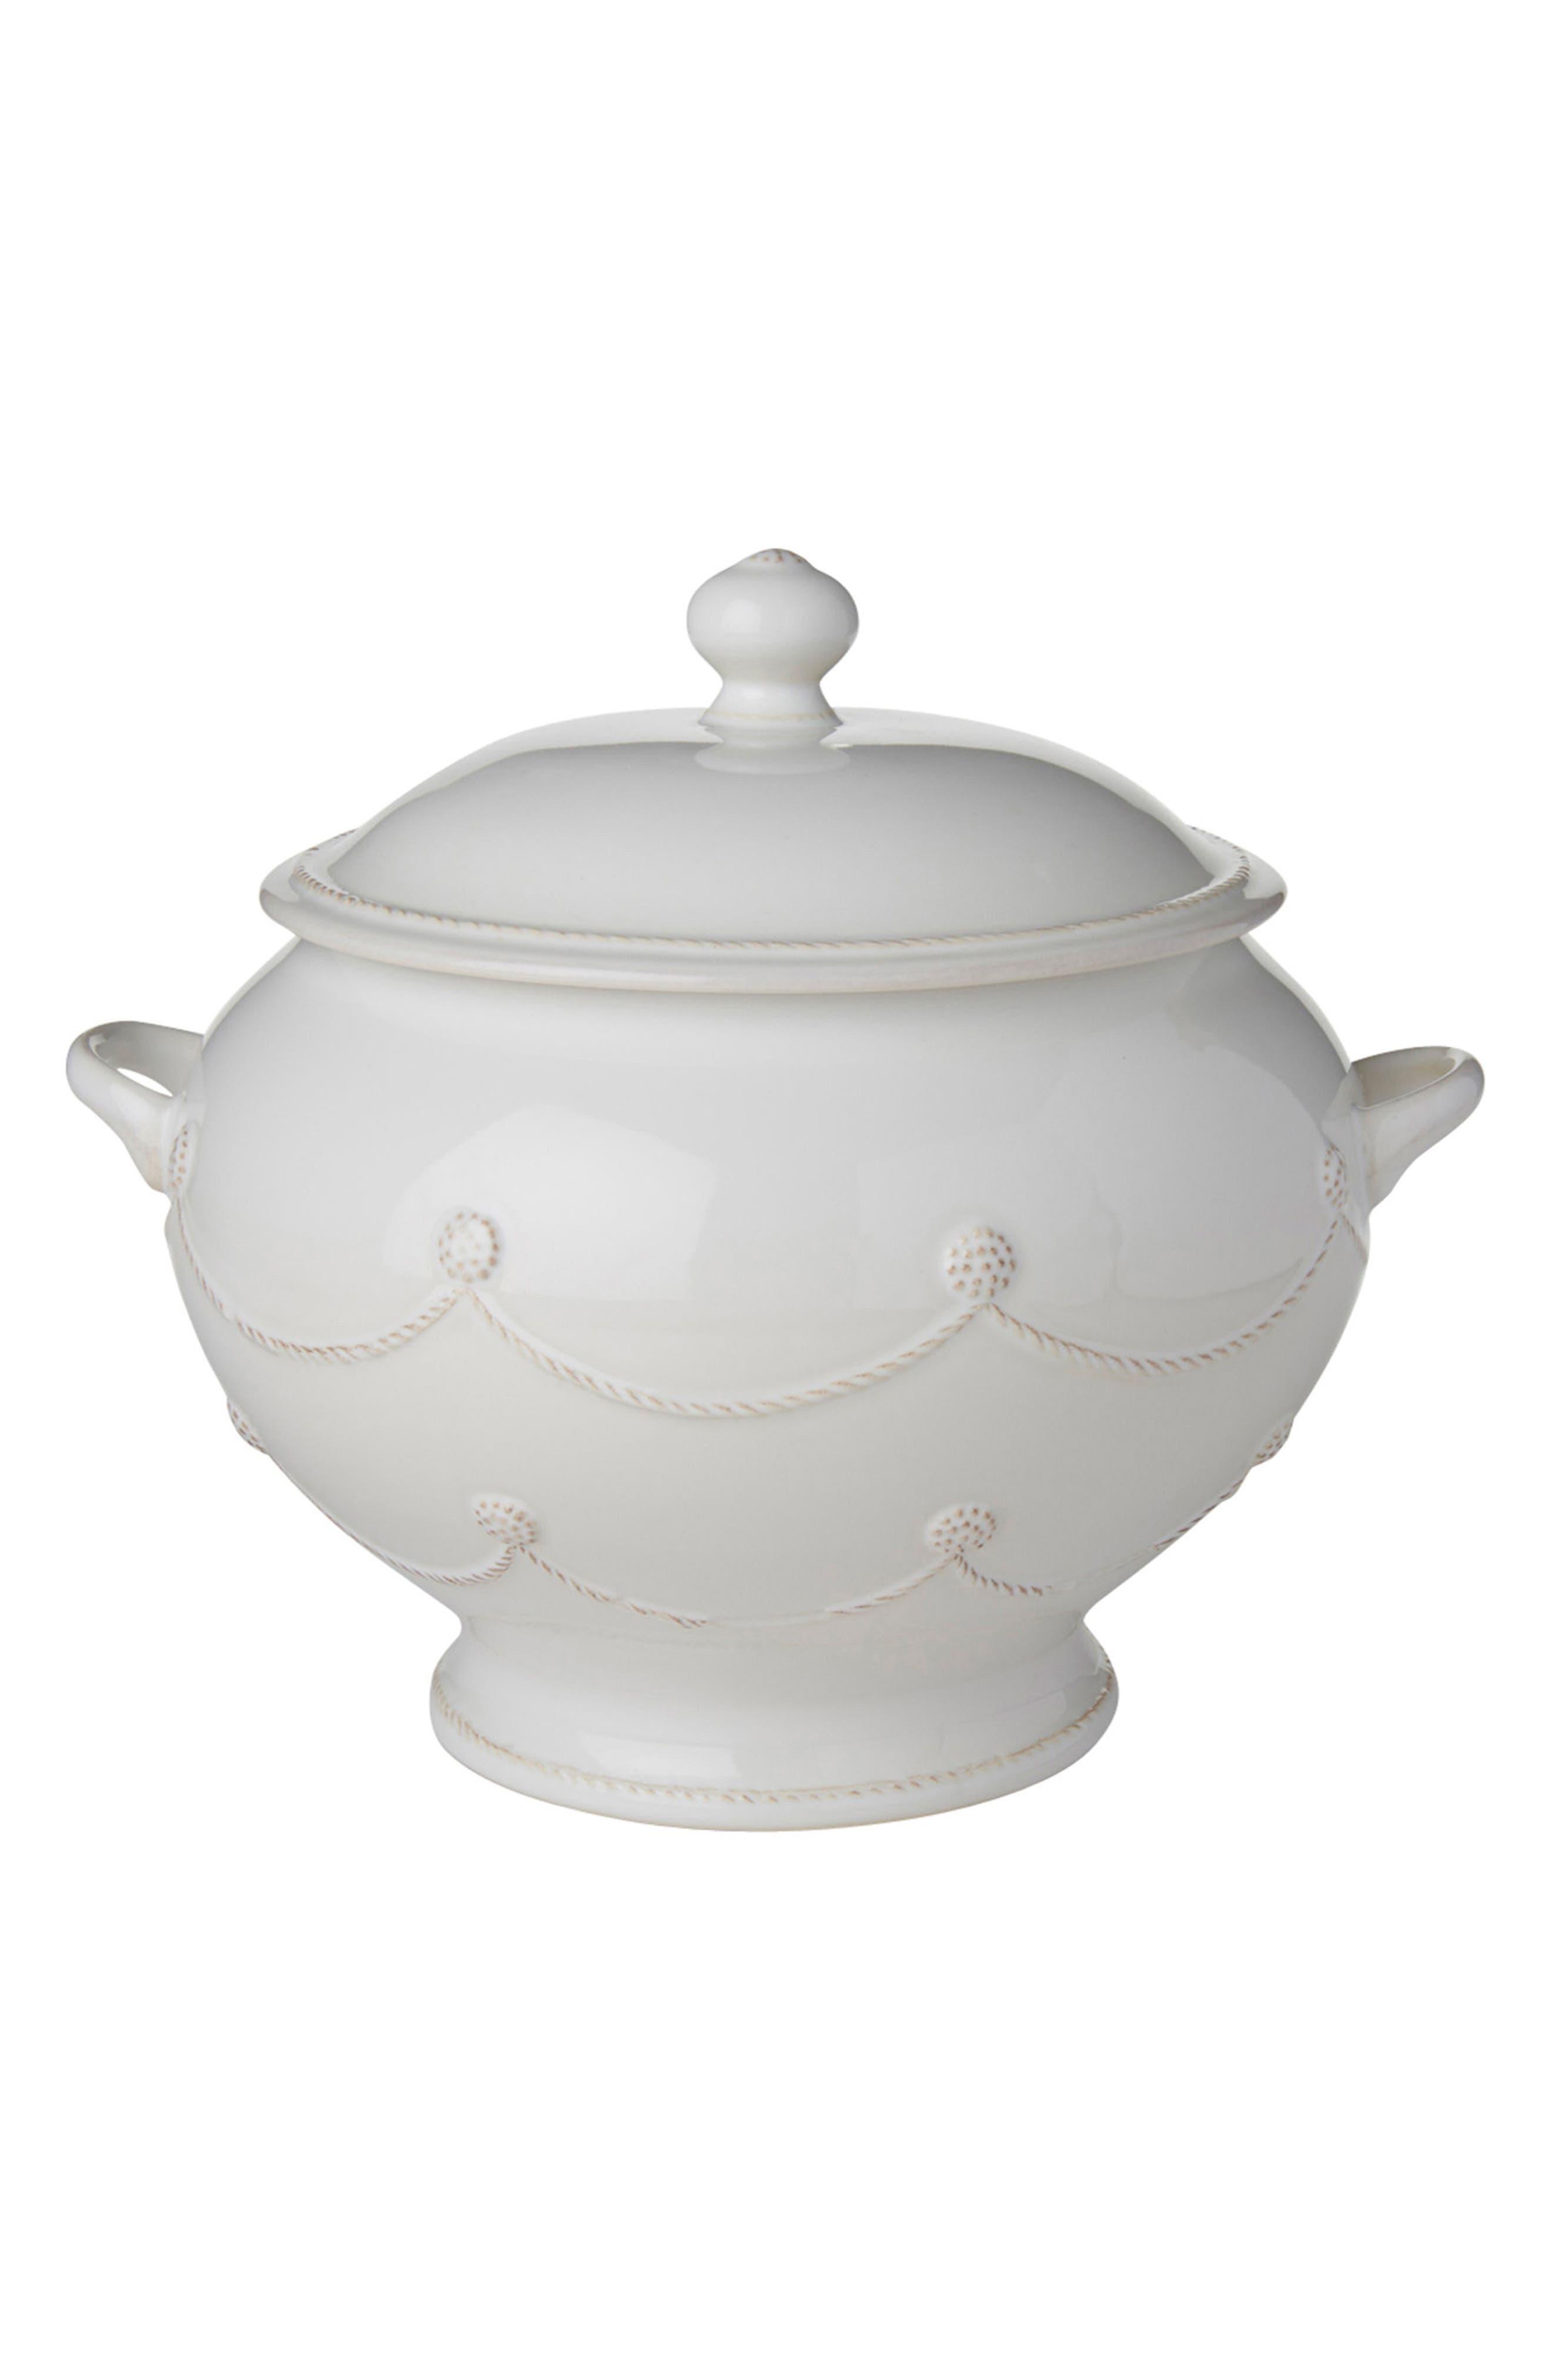 Main Image - Juliska Berry & Thread Ceramic Soup Tureen